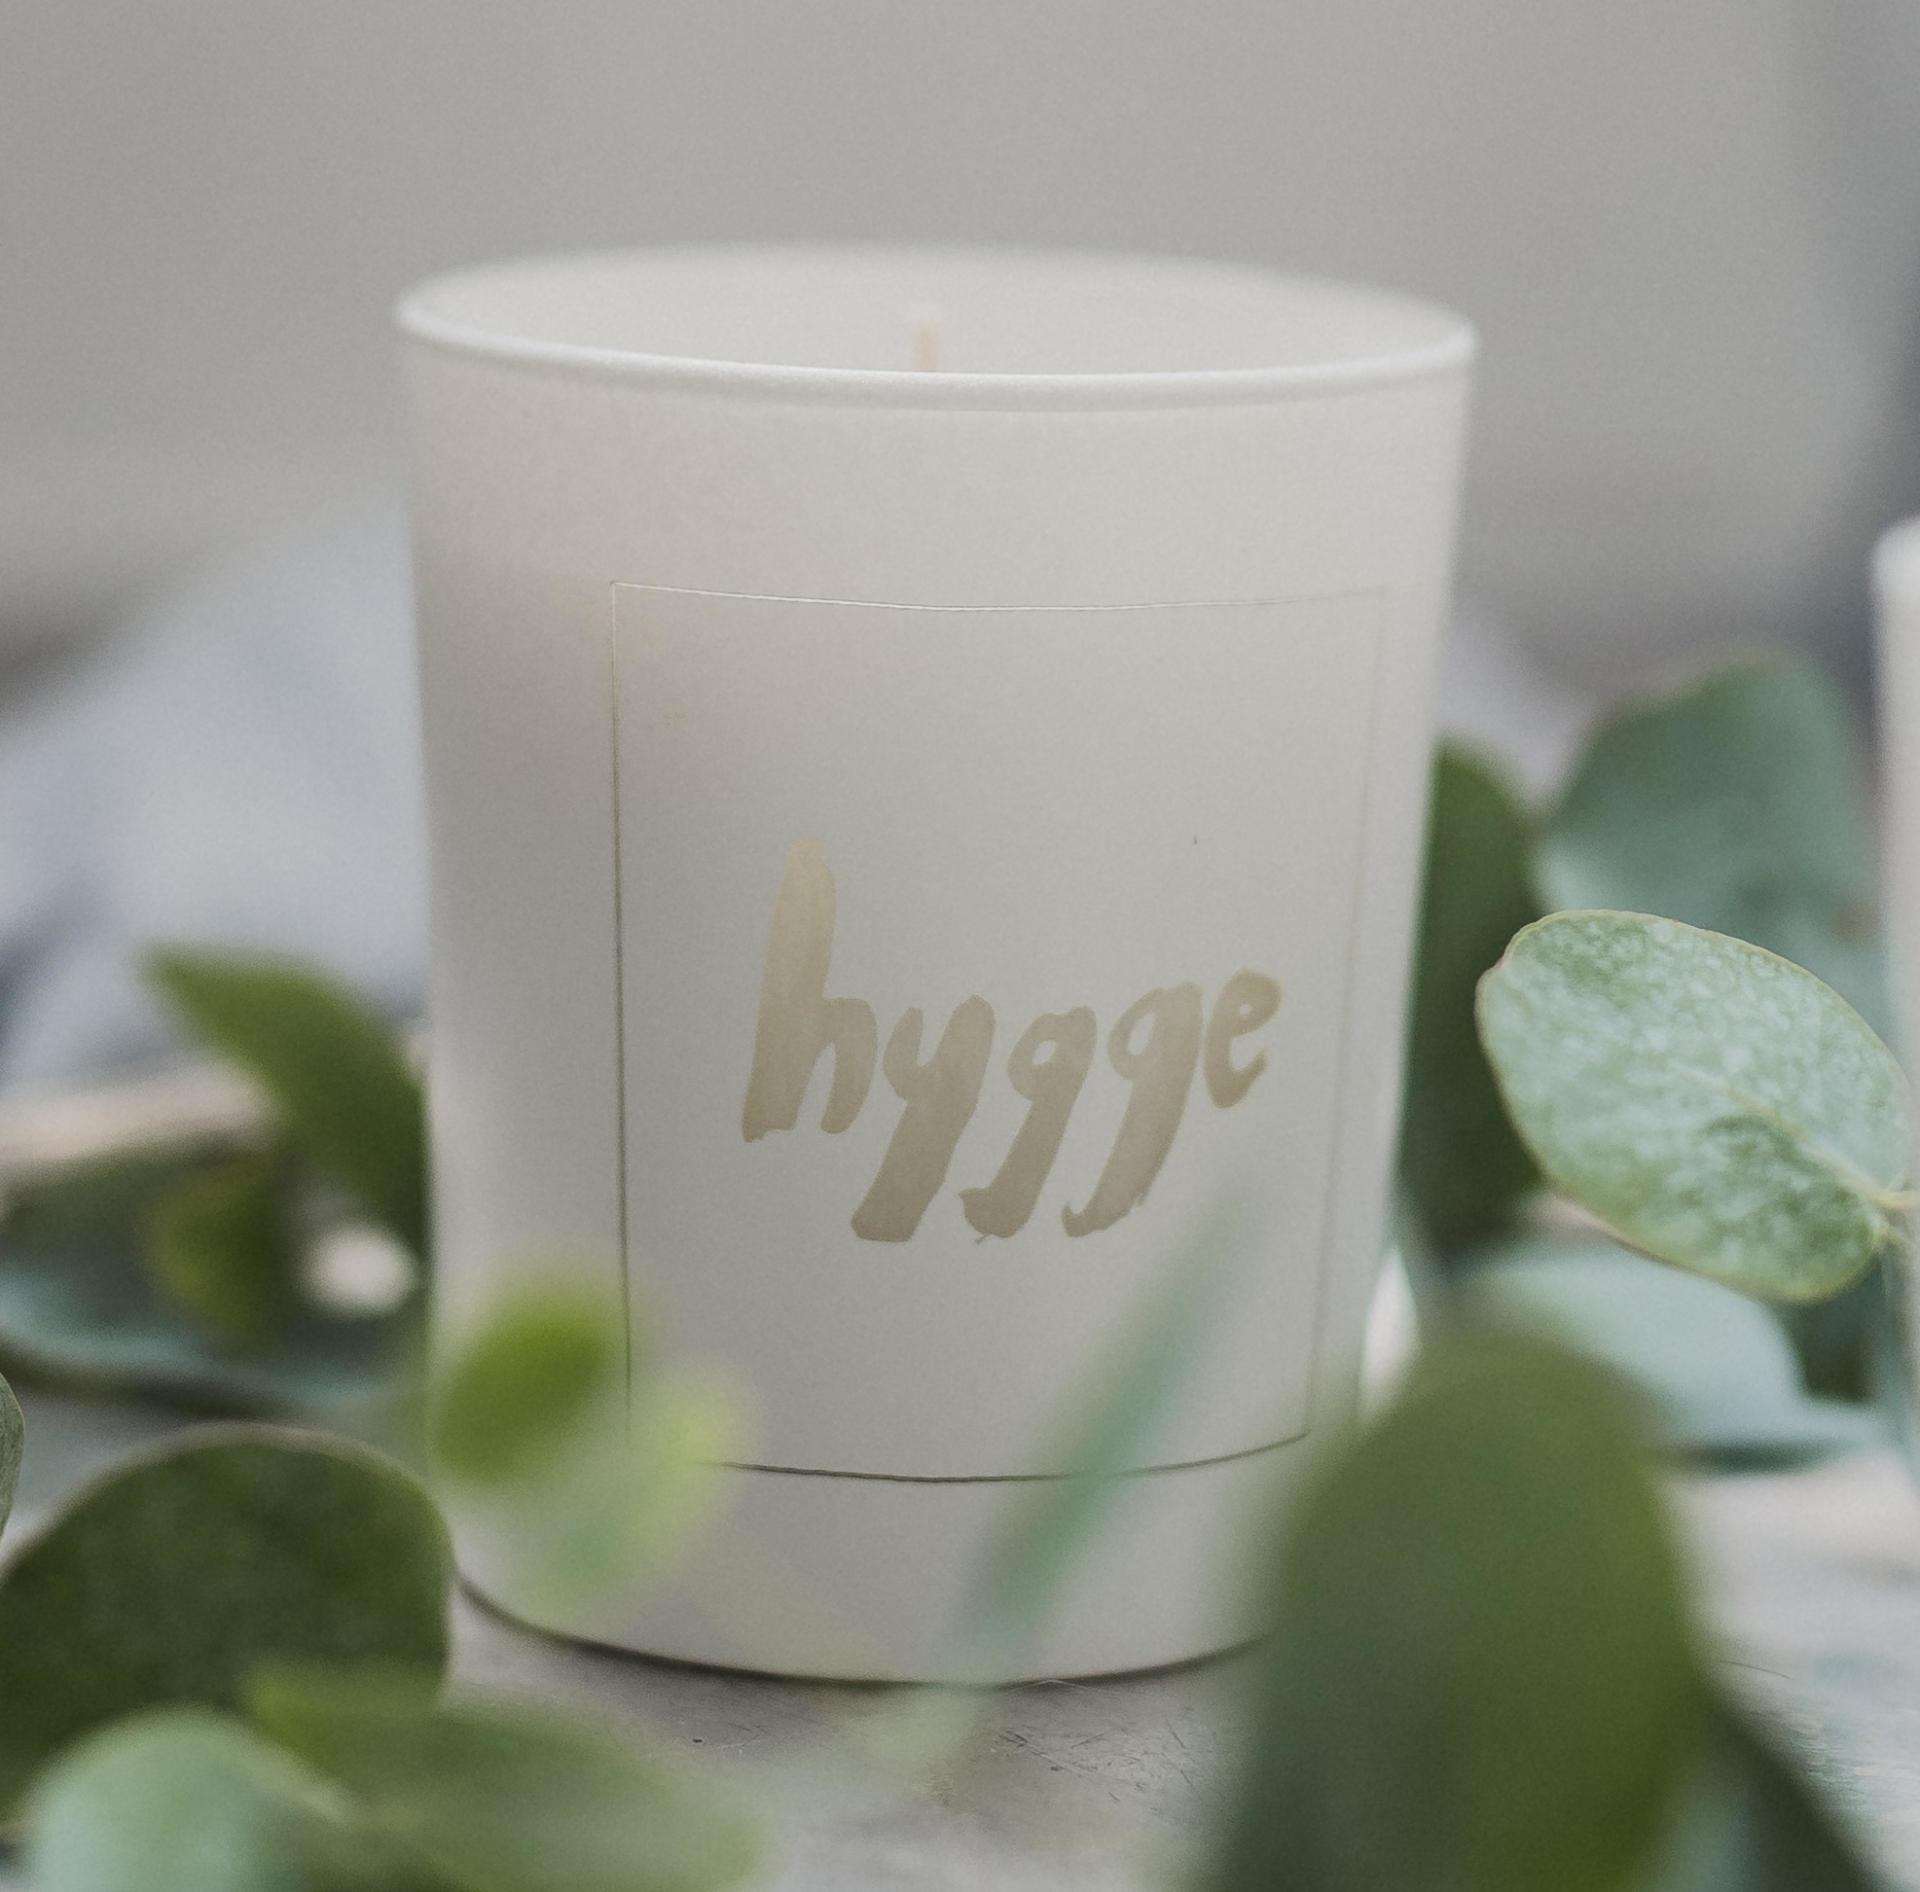 Love Inc. Bílá svíčka Hygge - fíky a bílé pižmo, bílá barva, sklo, dřevo, vosk